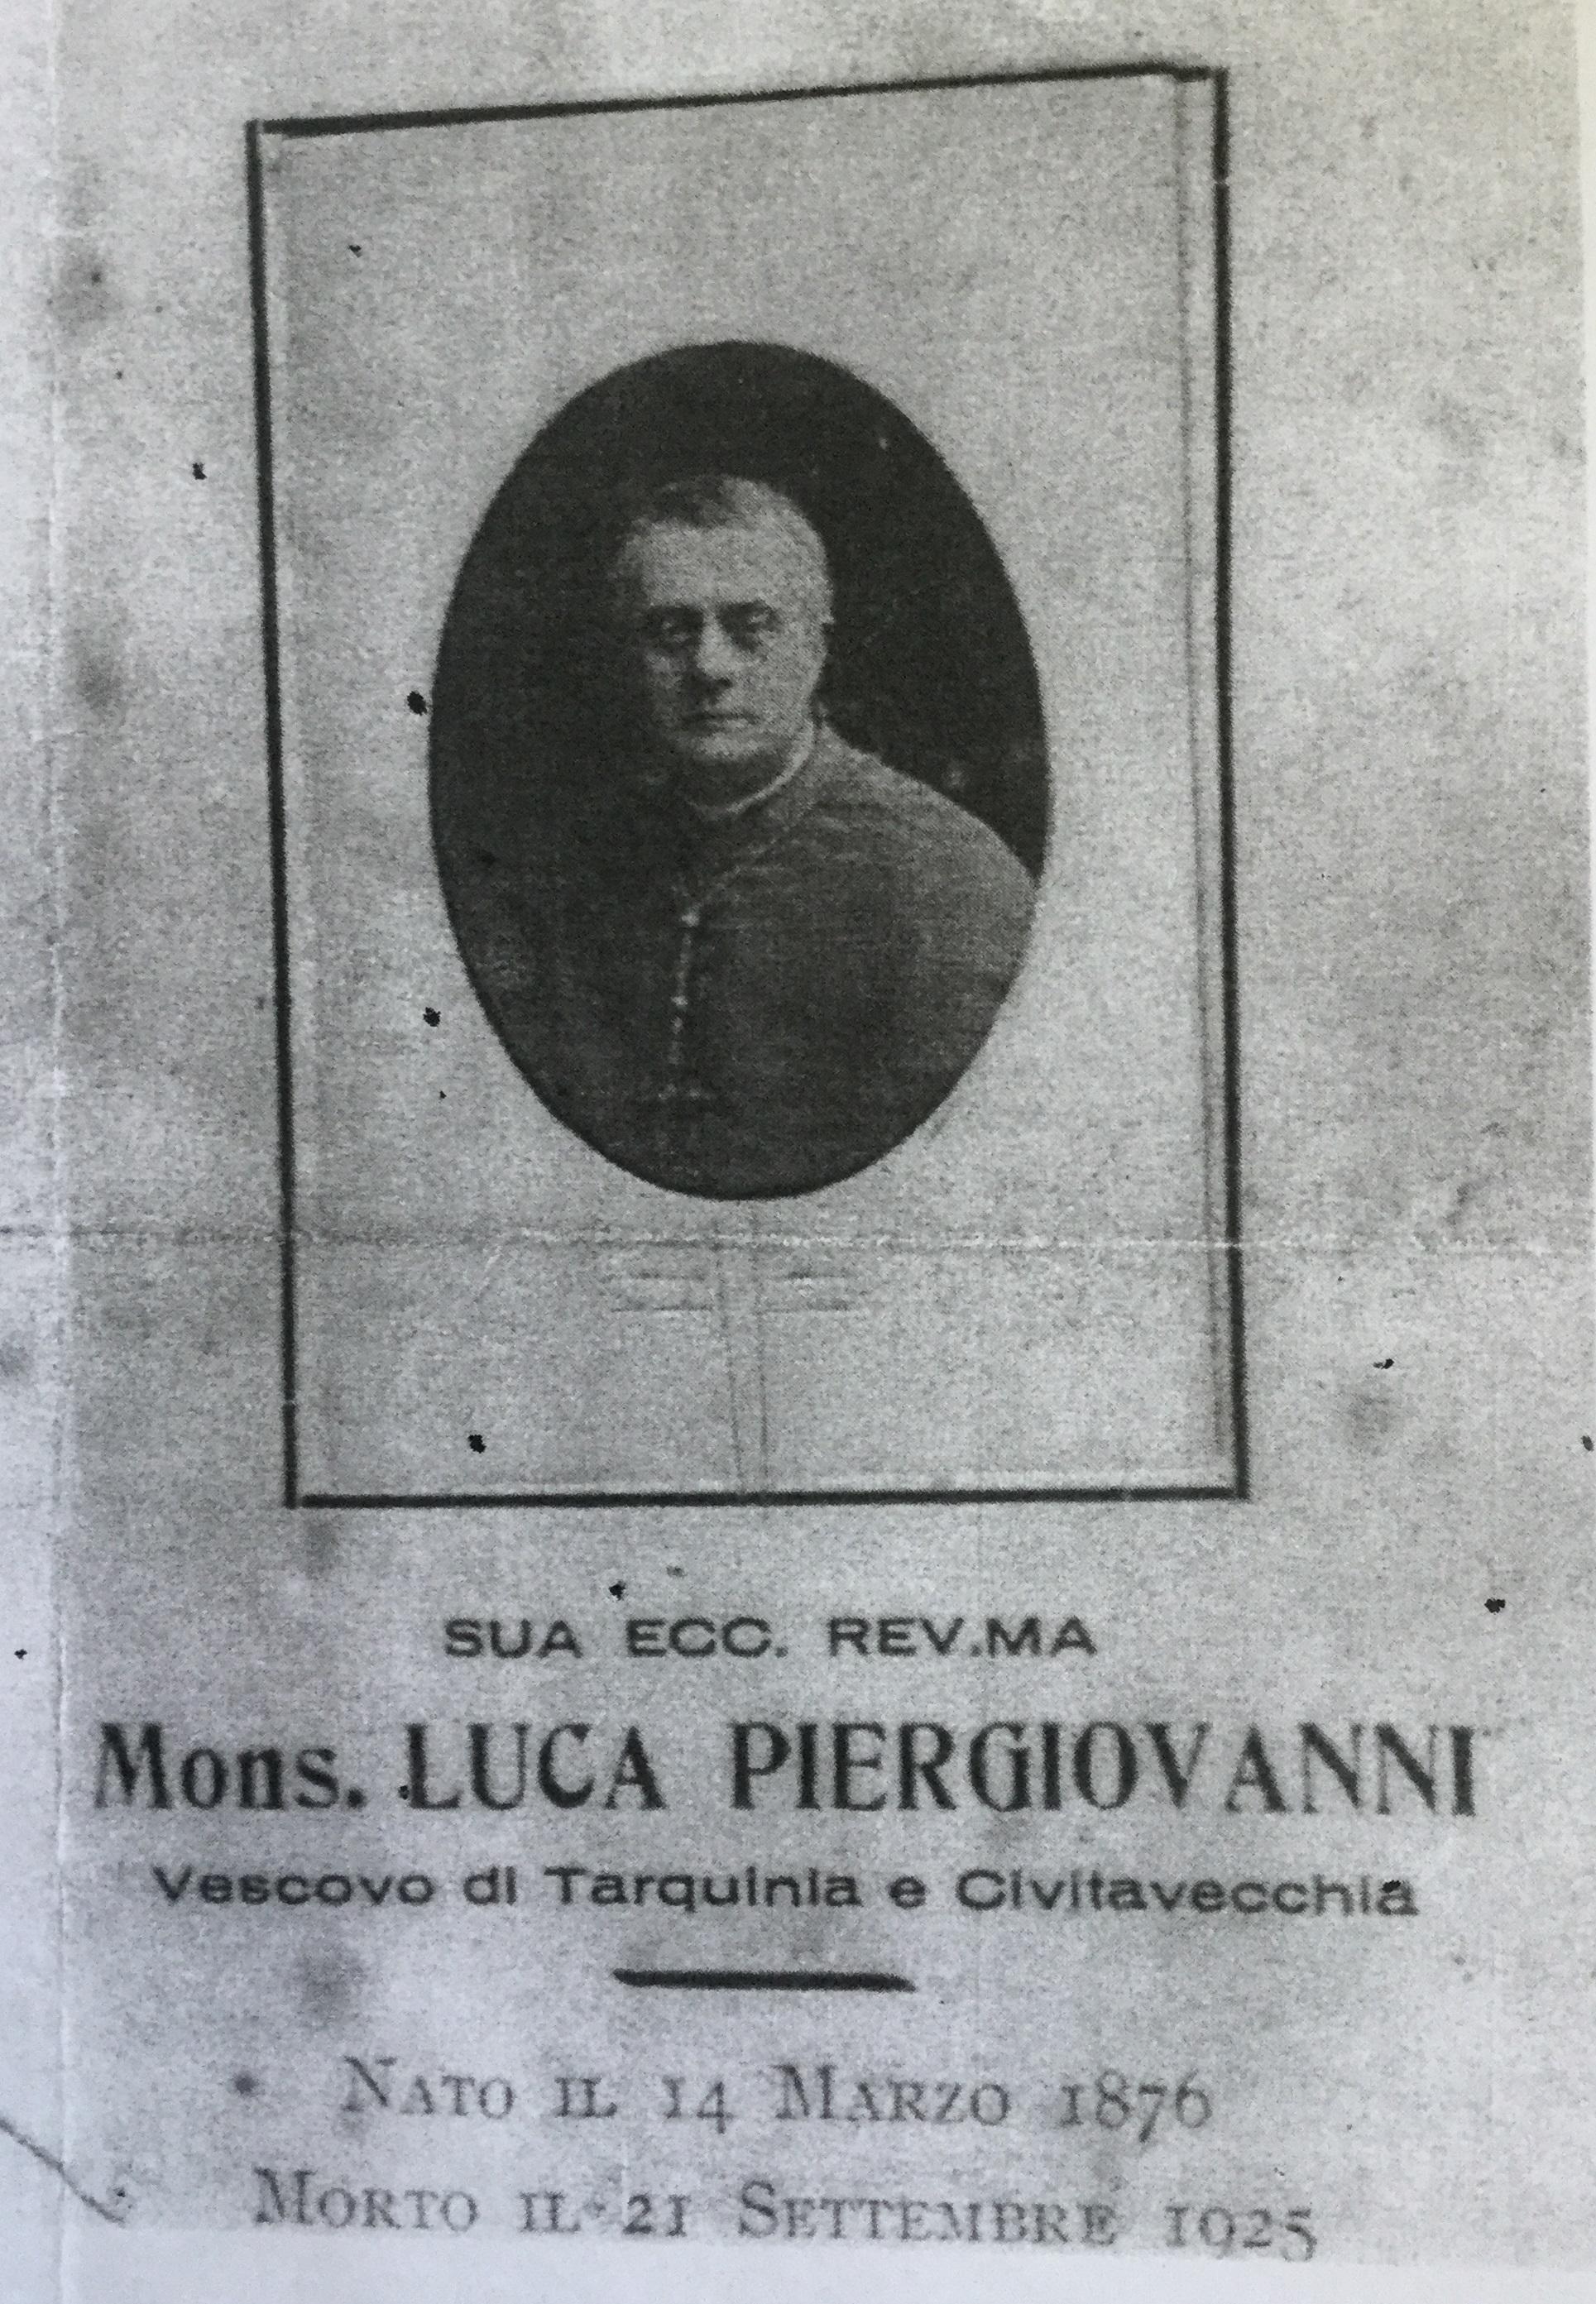 P5 - Luca